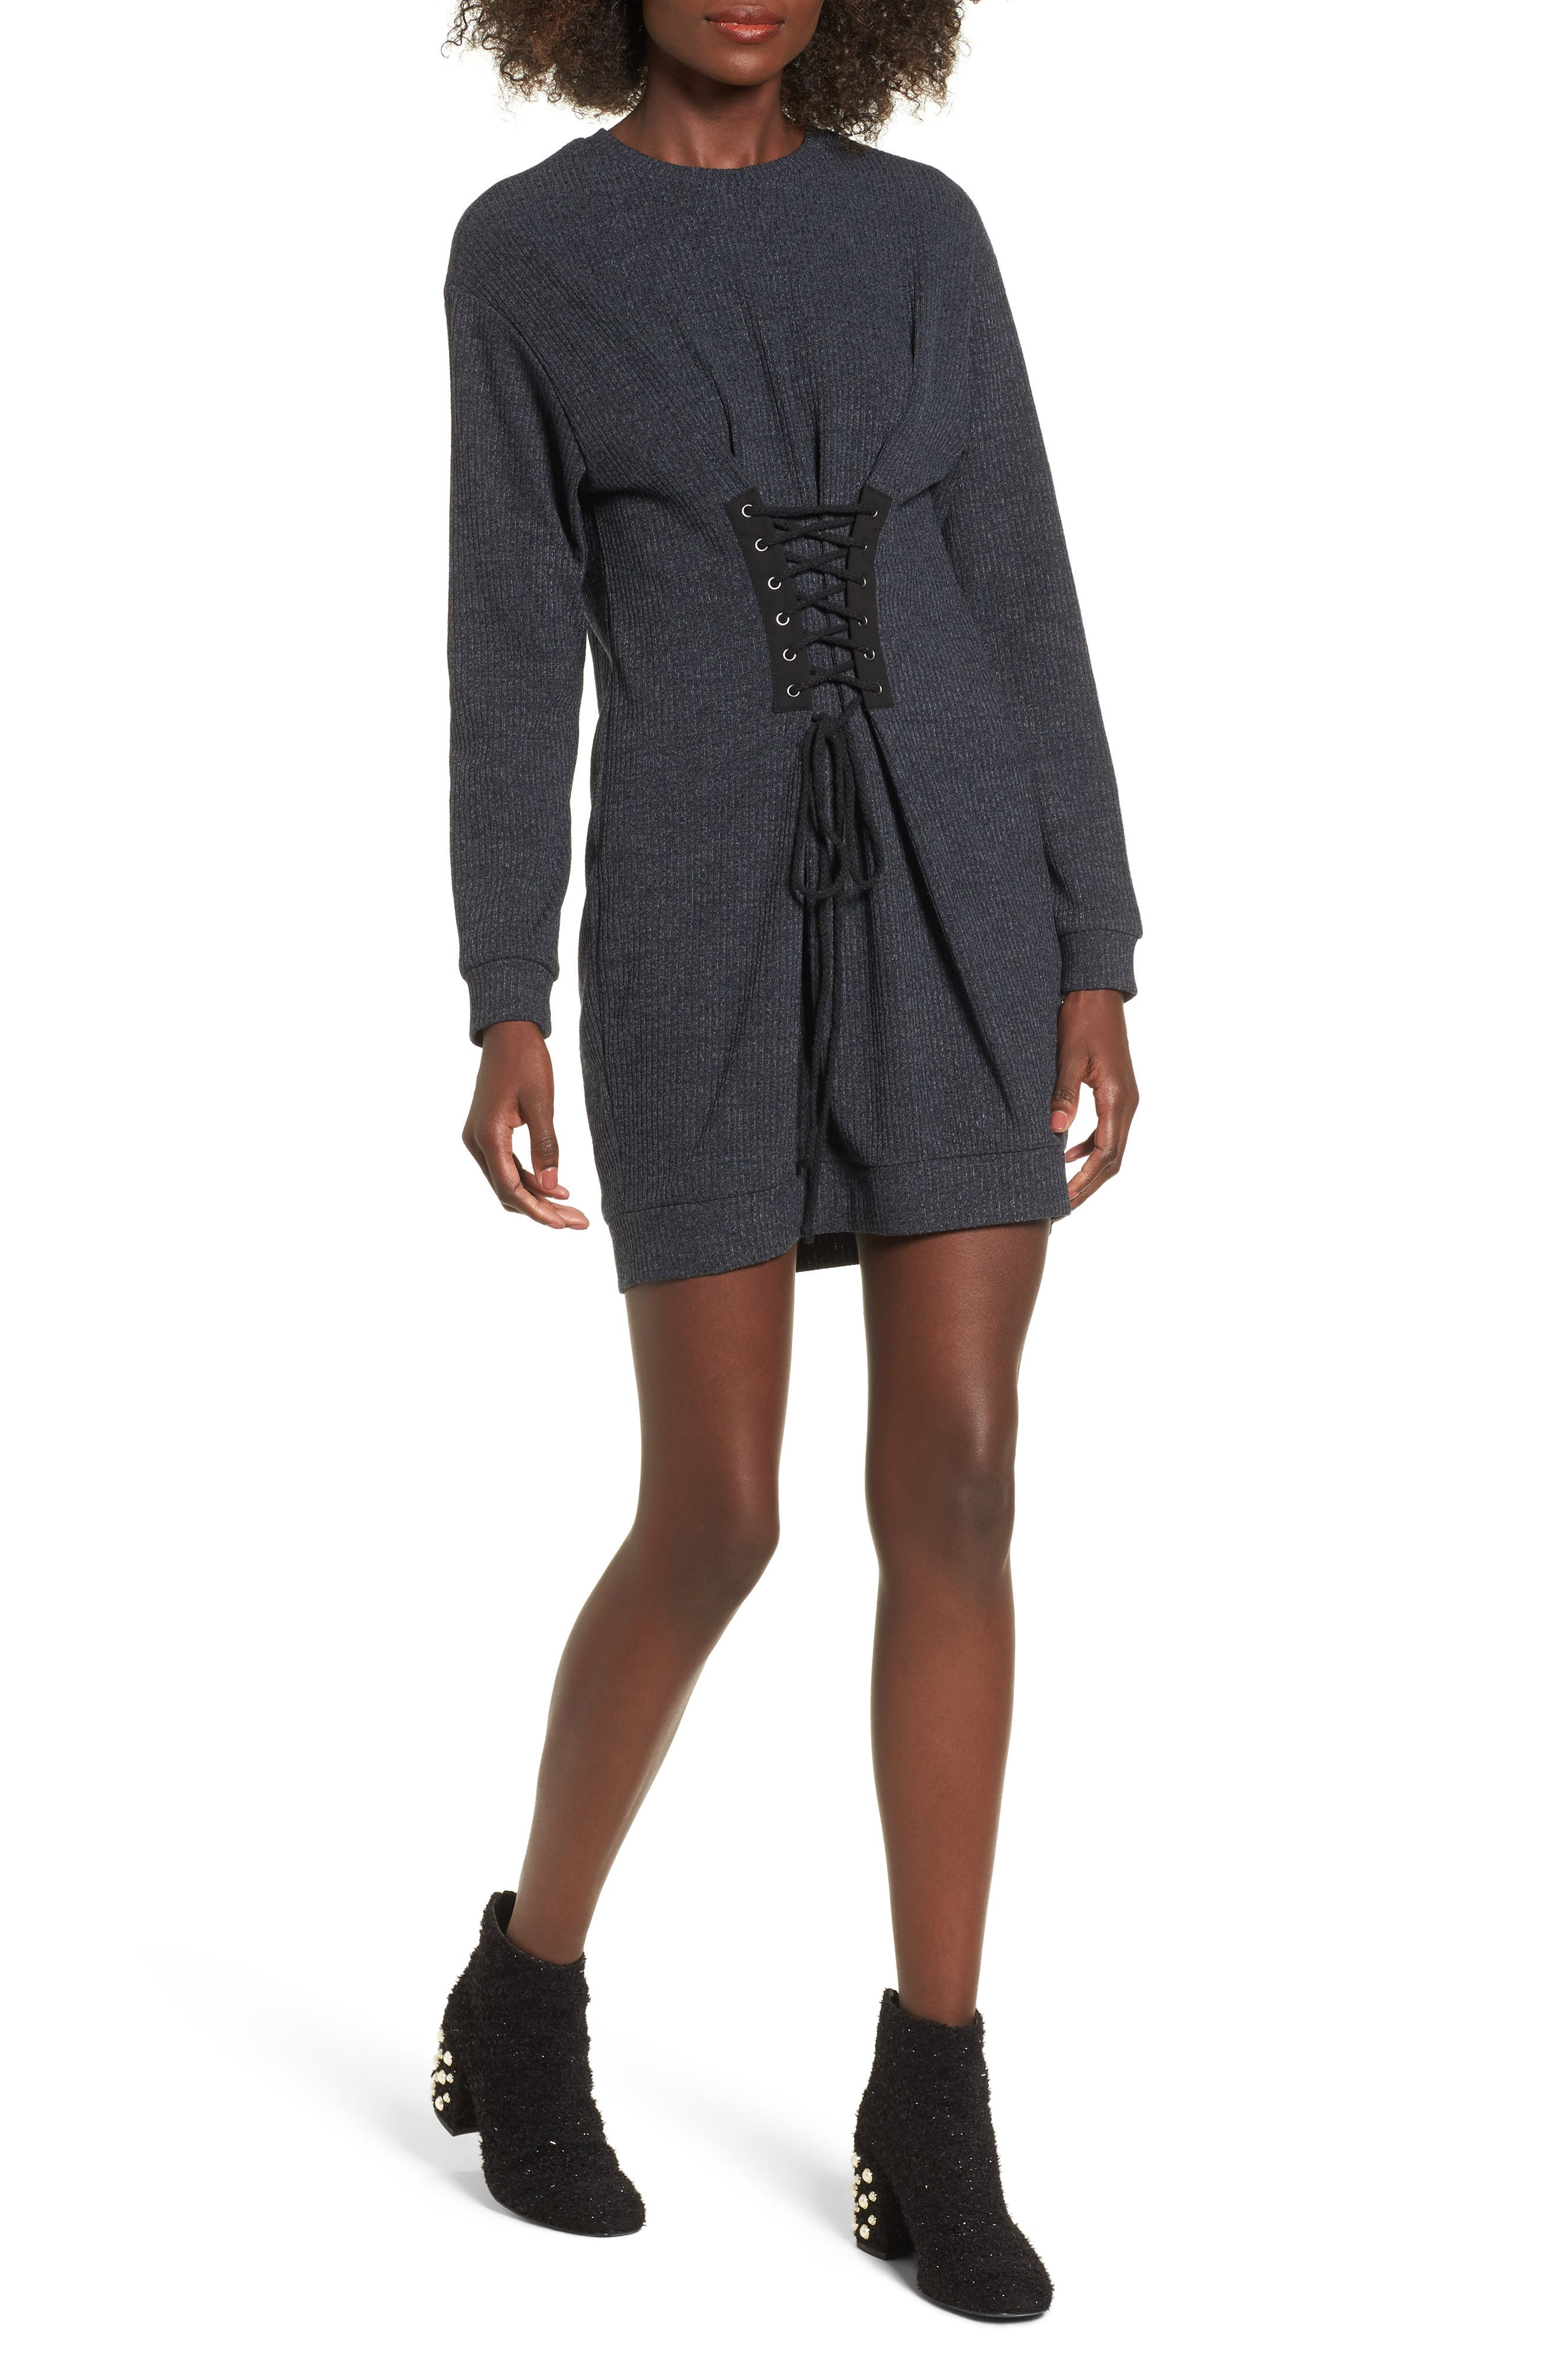 Alternate Image 1 Selected - WAYF Corset Detail Sweatshirt Dress